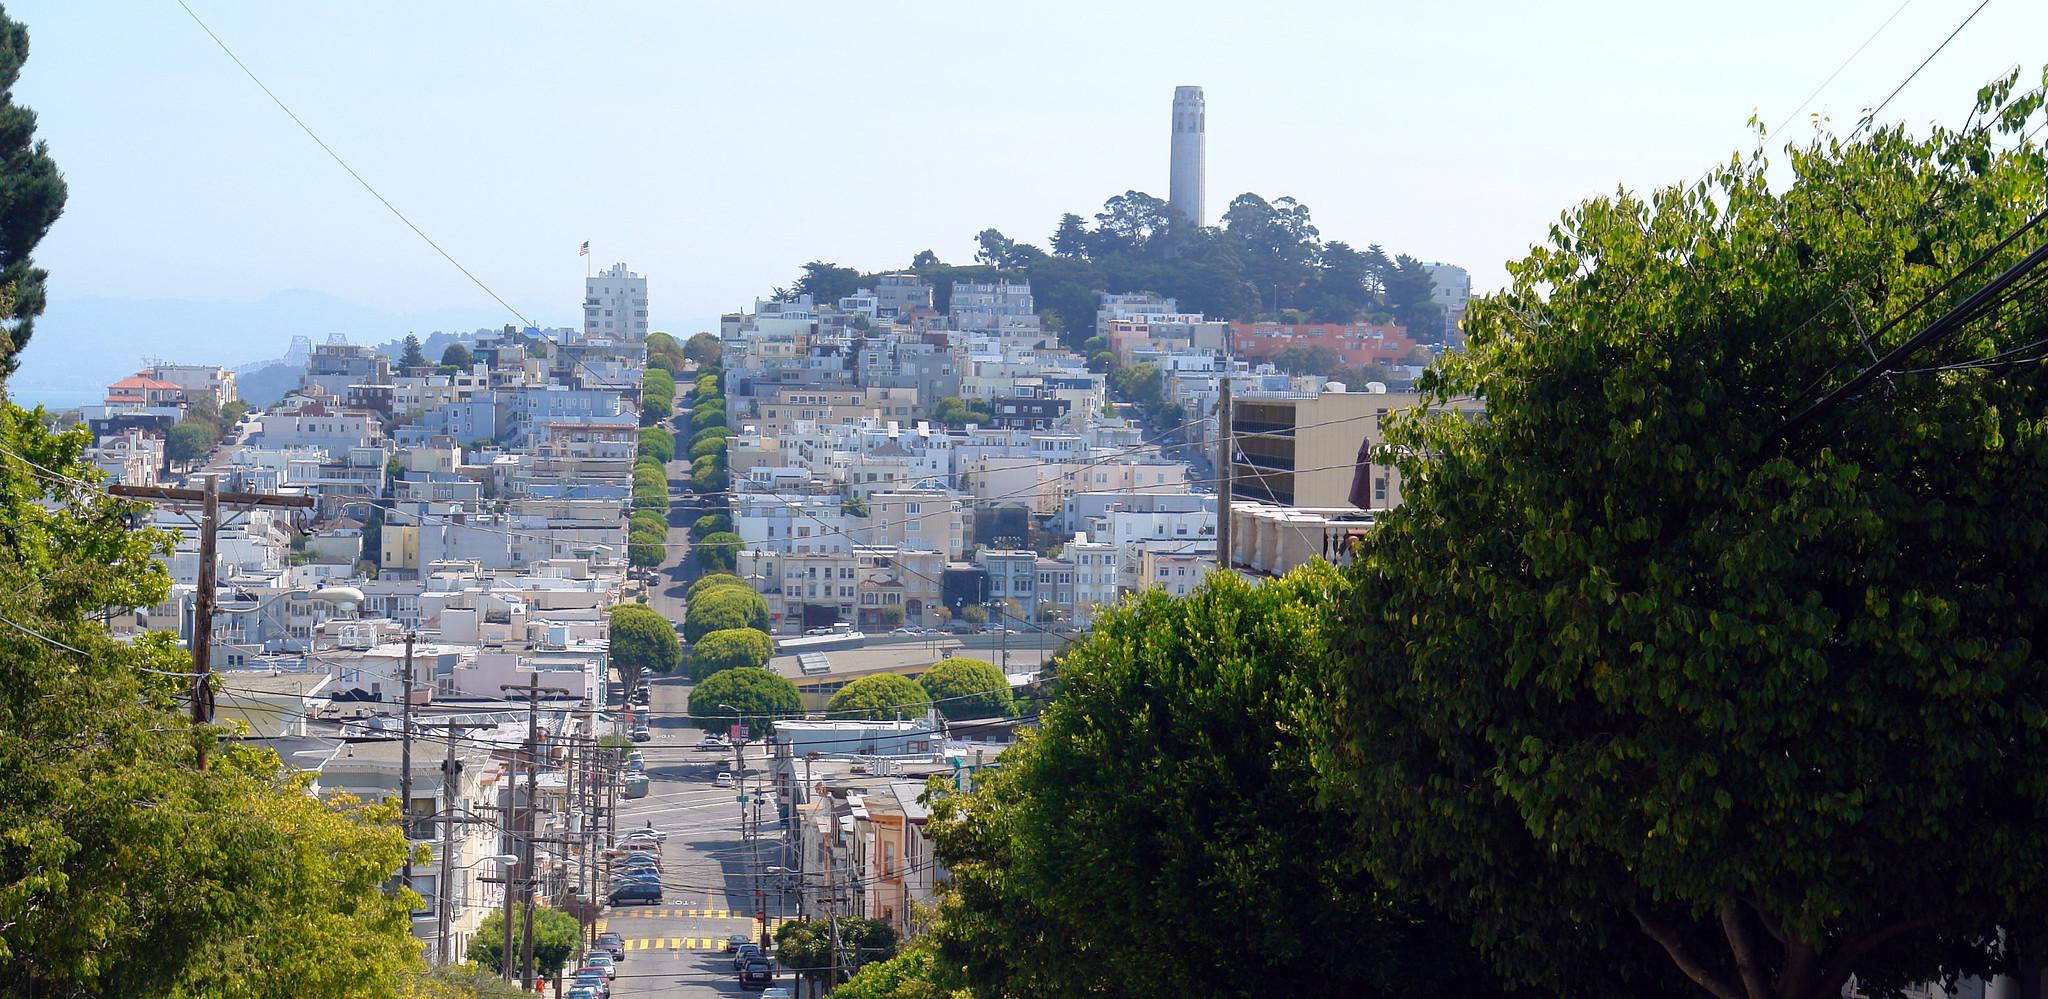 Que ver en San Francisco, California que ver en san francisco - 40842771312 55b7c04ba4 k - 10 lugares mágicos que ver en San Francisco, California